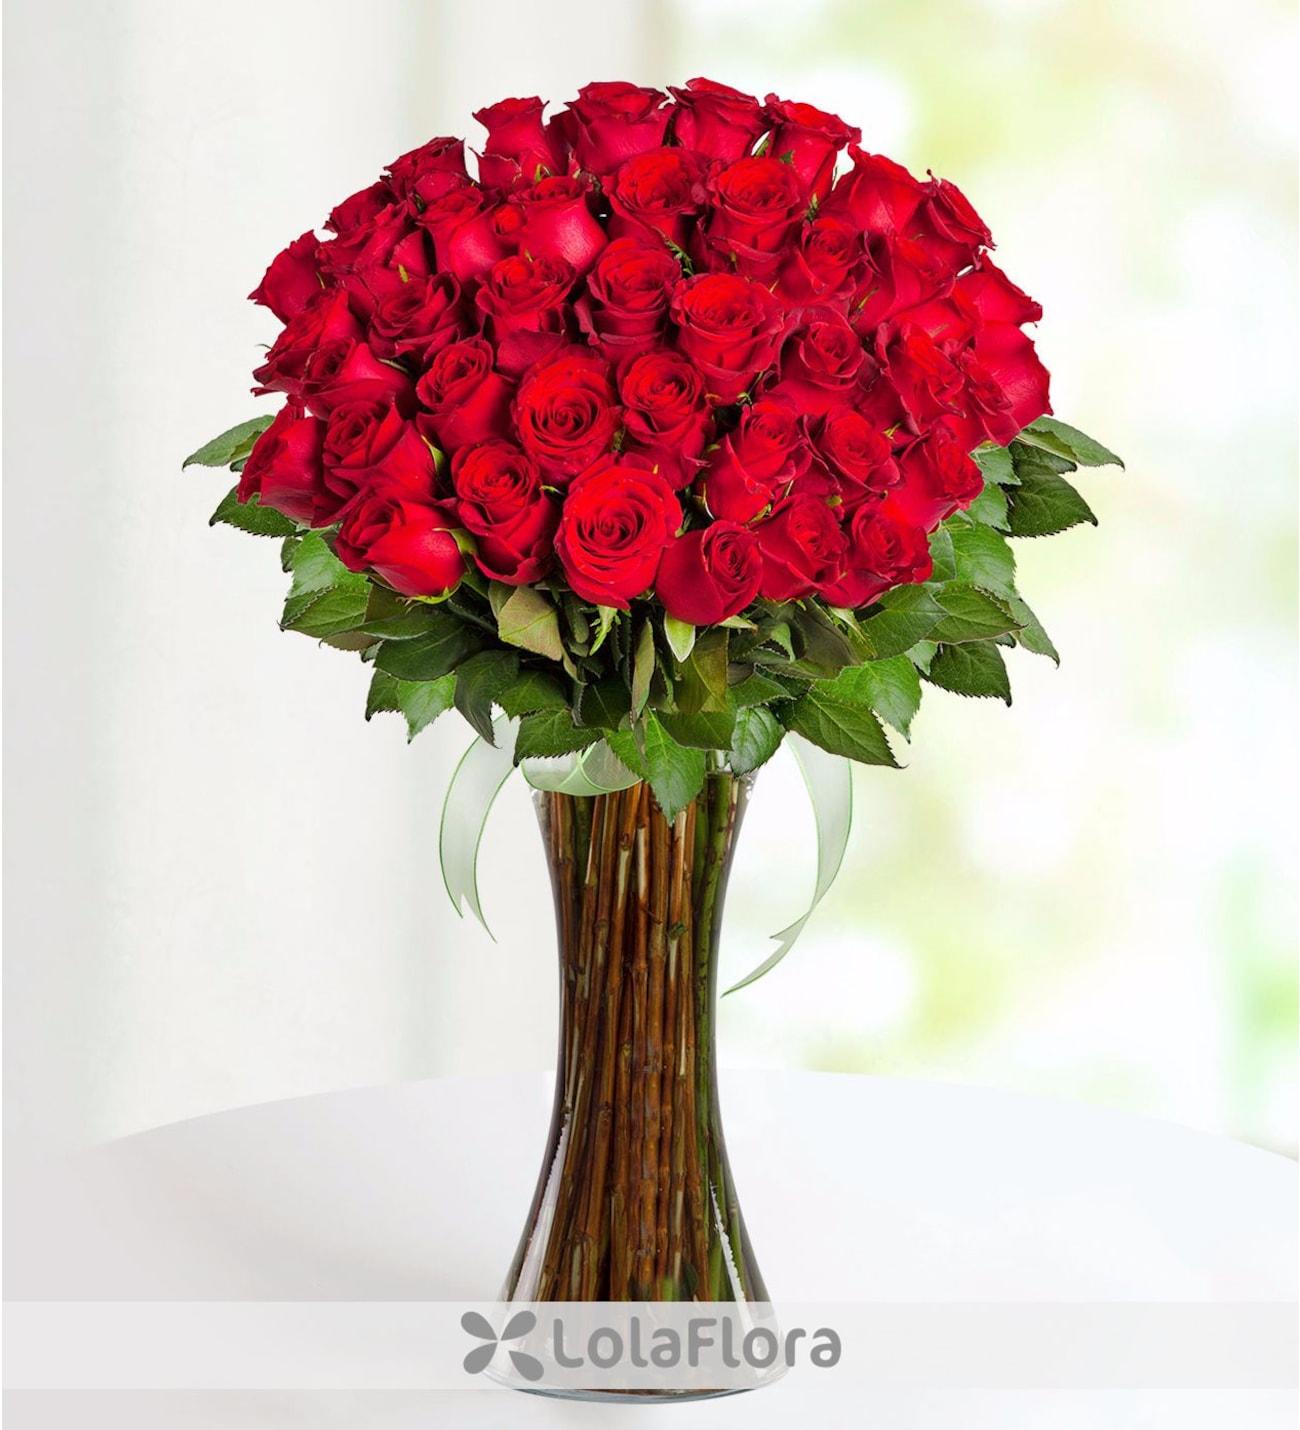 da5c2d918cd80 41 rosas rojas frescas de tallo largo en distinguido florero